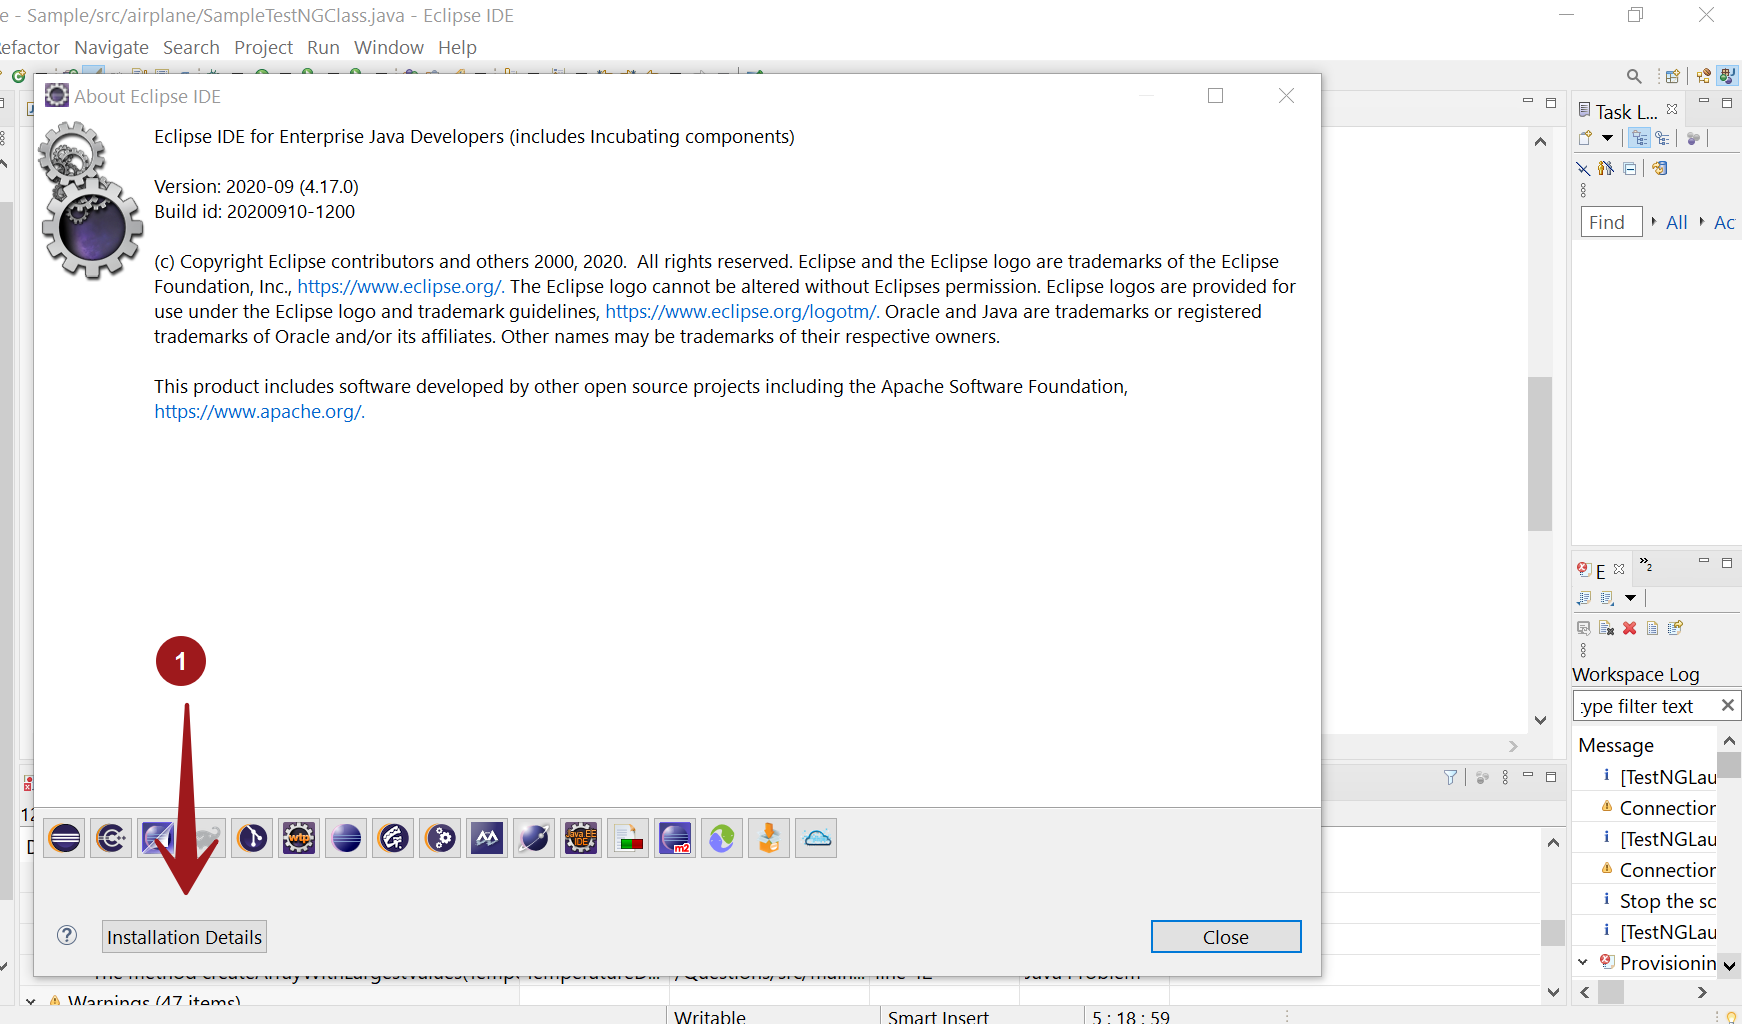 Eclipse Software Details